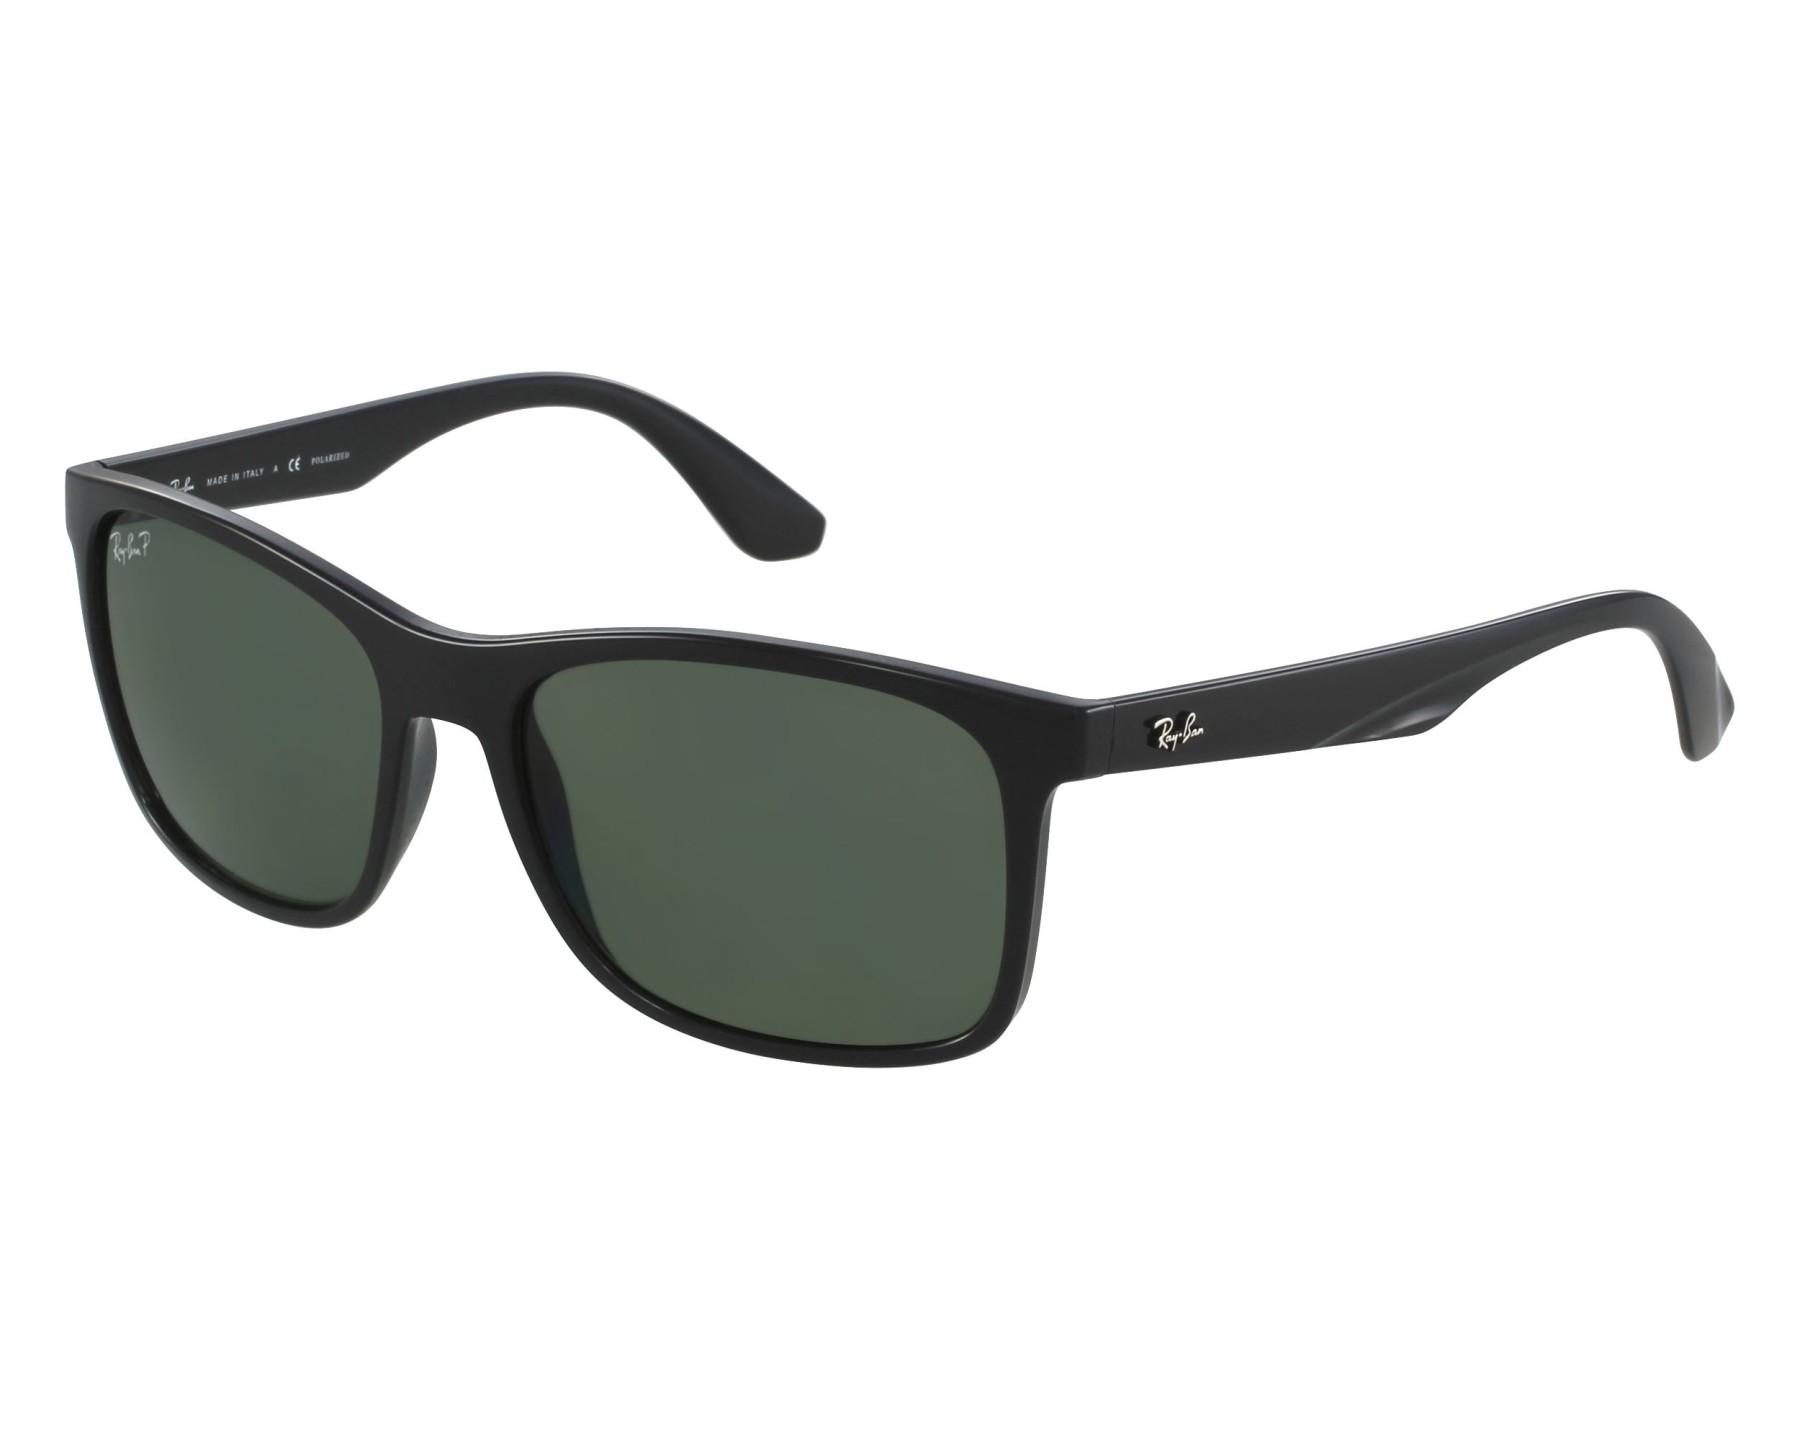 0fd6c29e220b Sunglasses Ray-Ban RB-4232 601/9A 57-17 Black front view